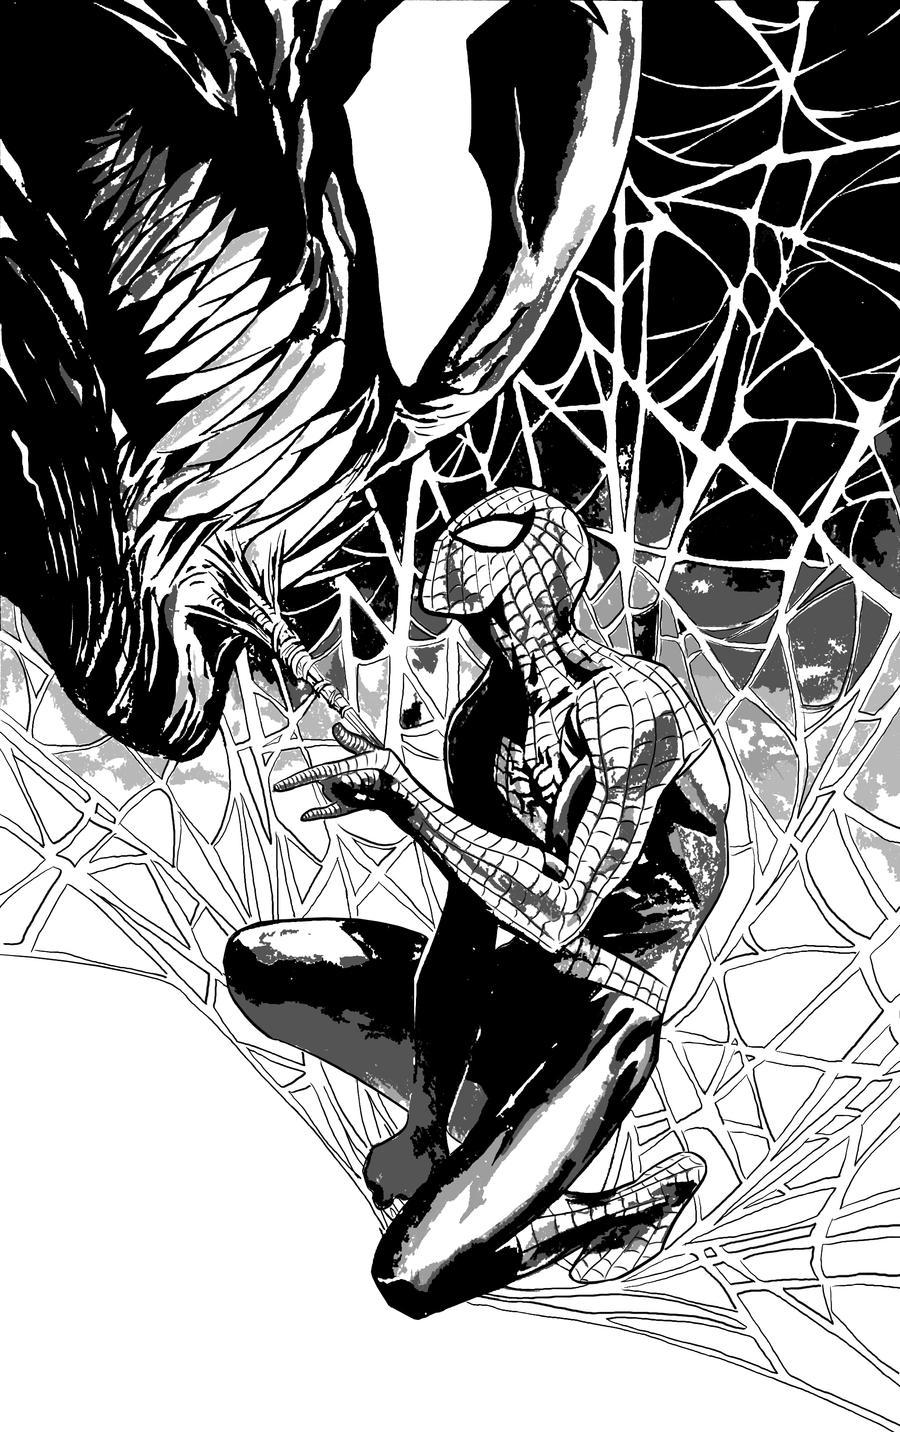 Venom Spiderman Drawing Venom Spider-ma...